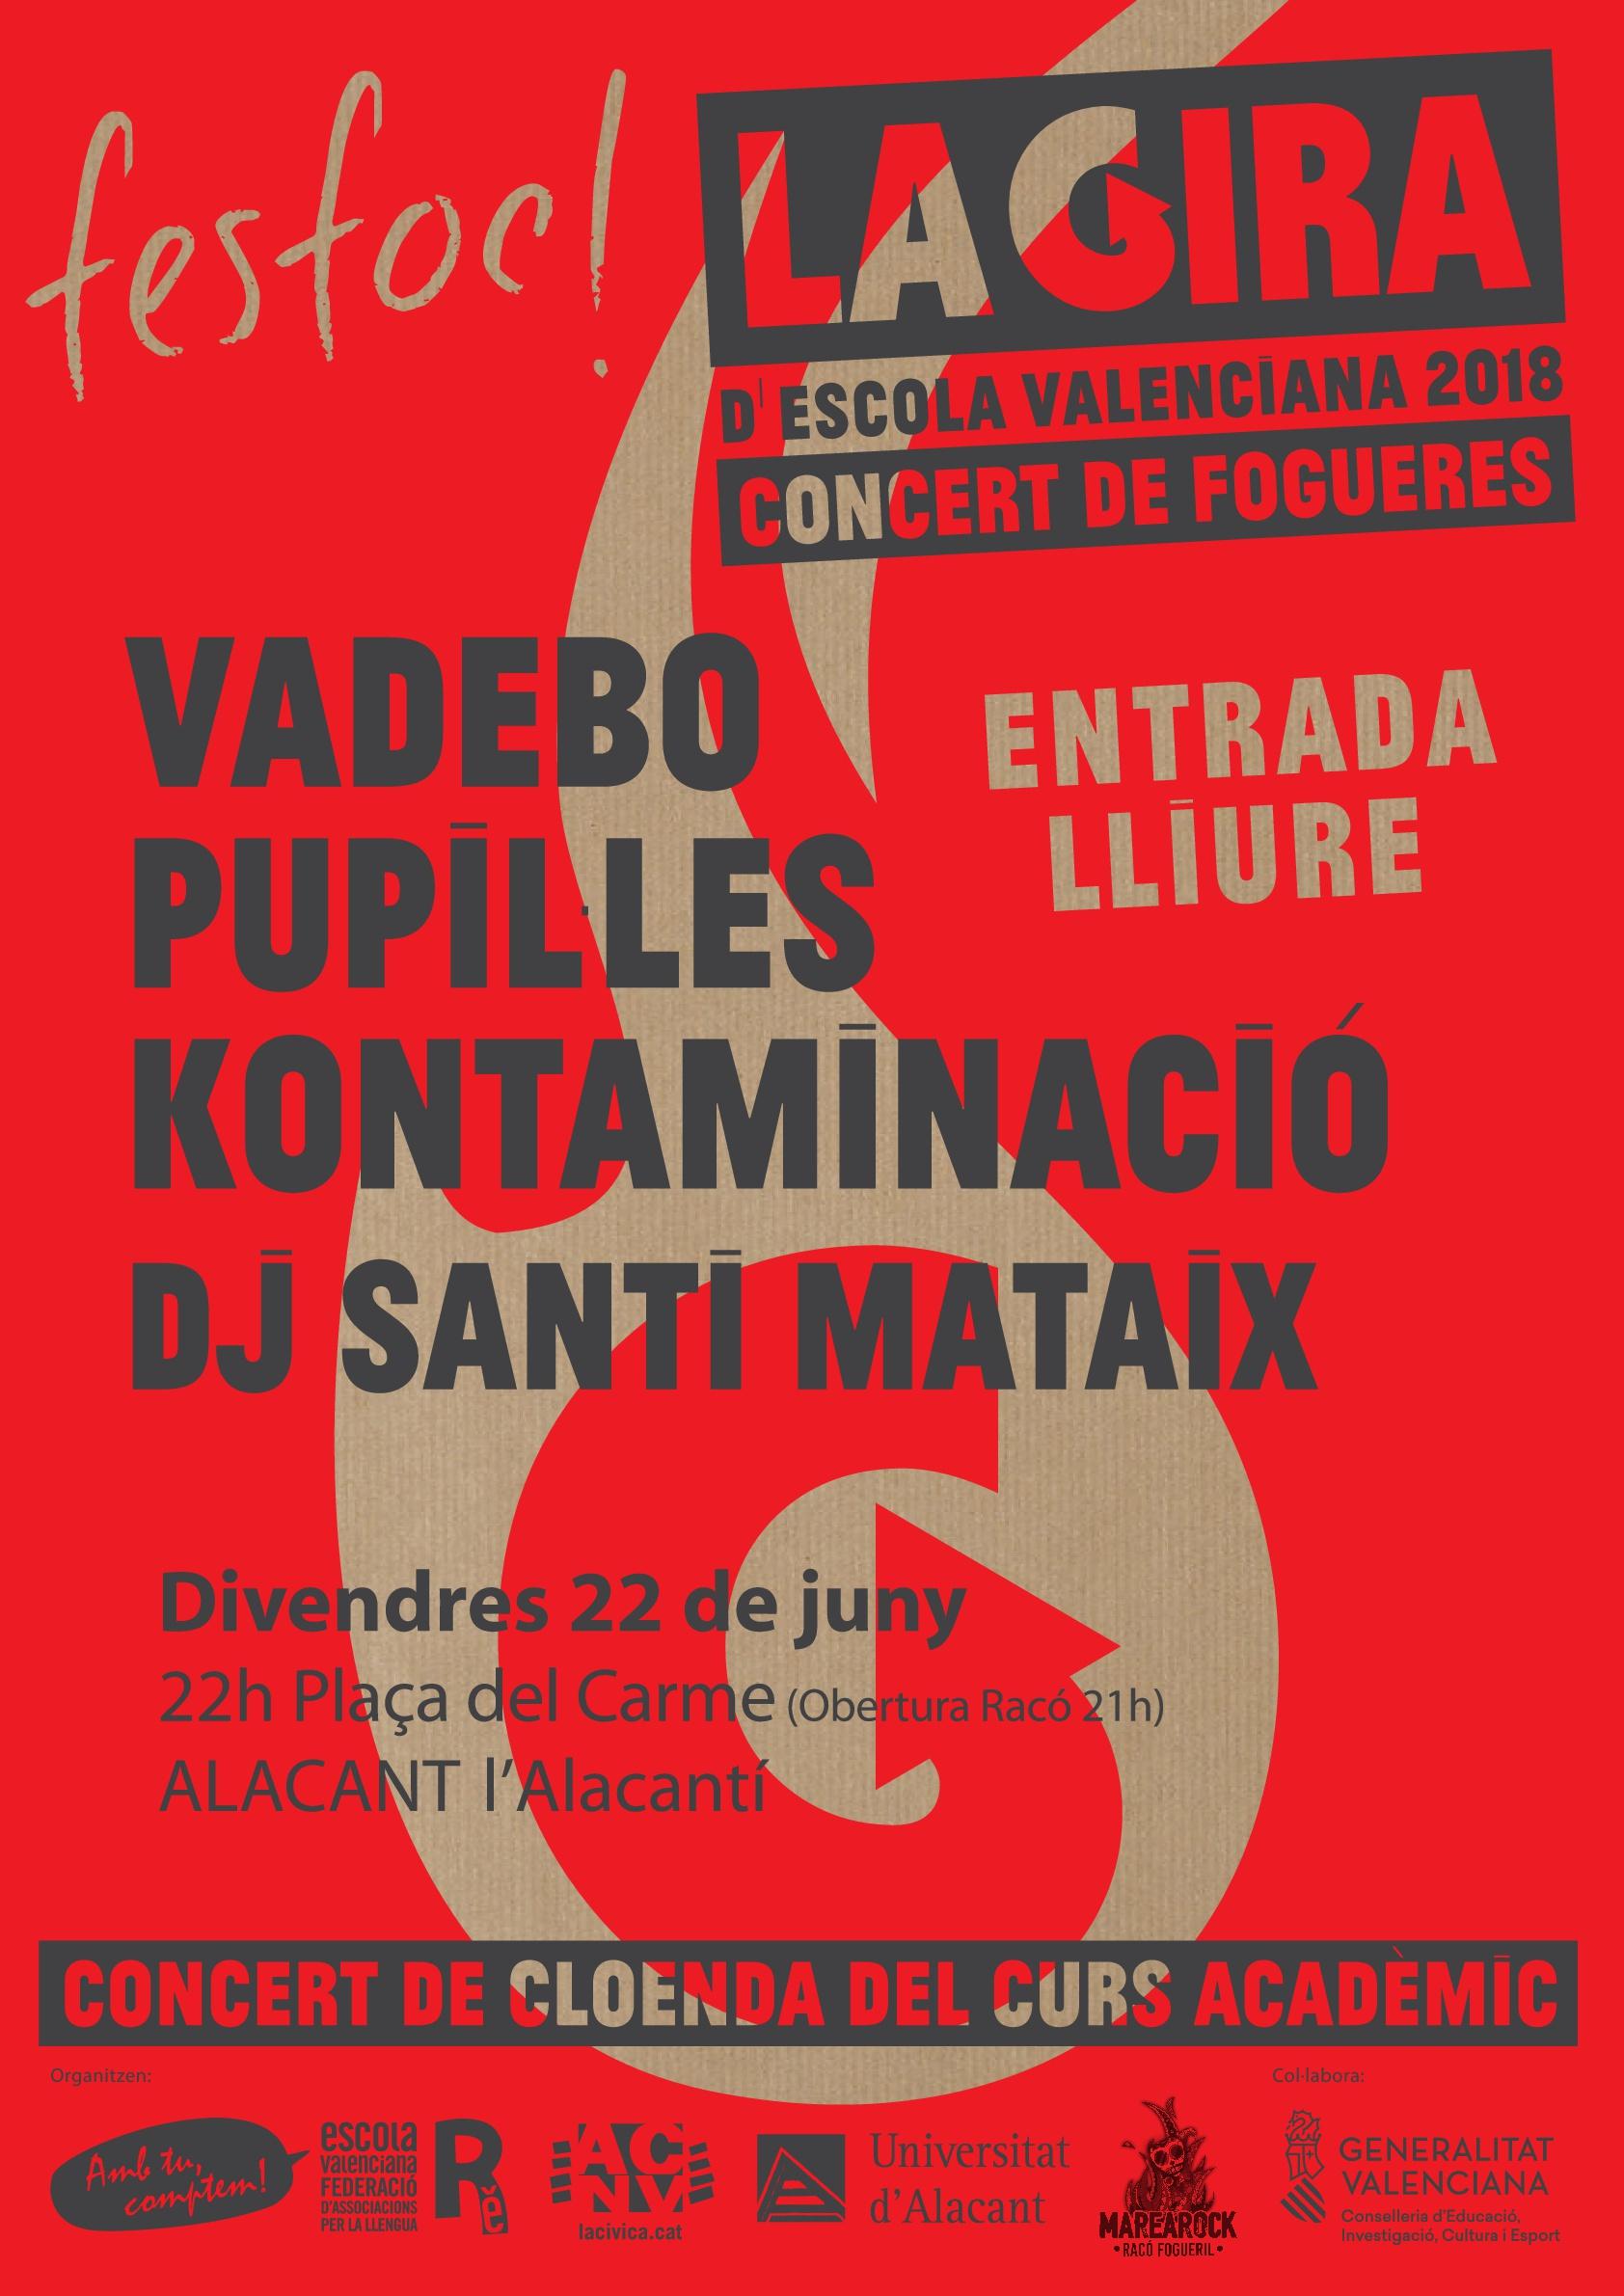 ALACANT: FESFOC 2018 Concert de Fogueres